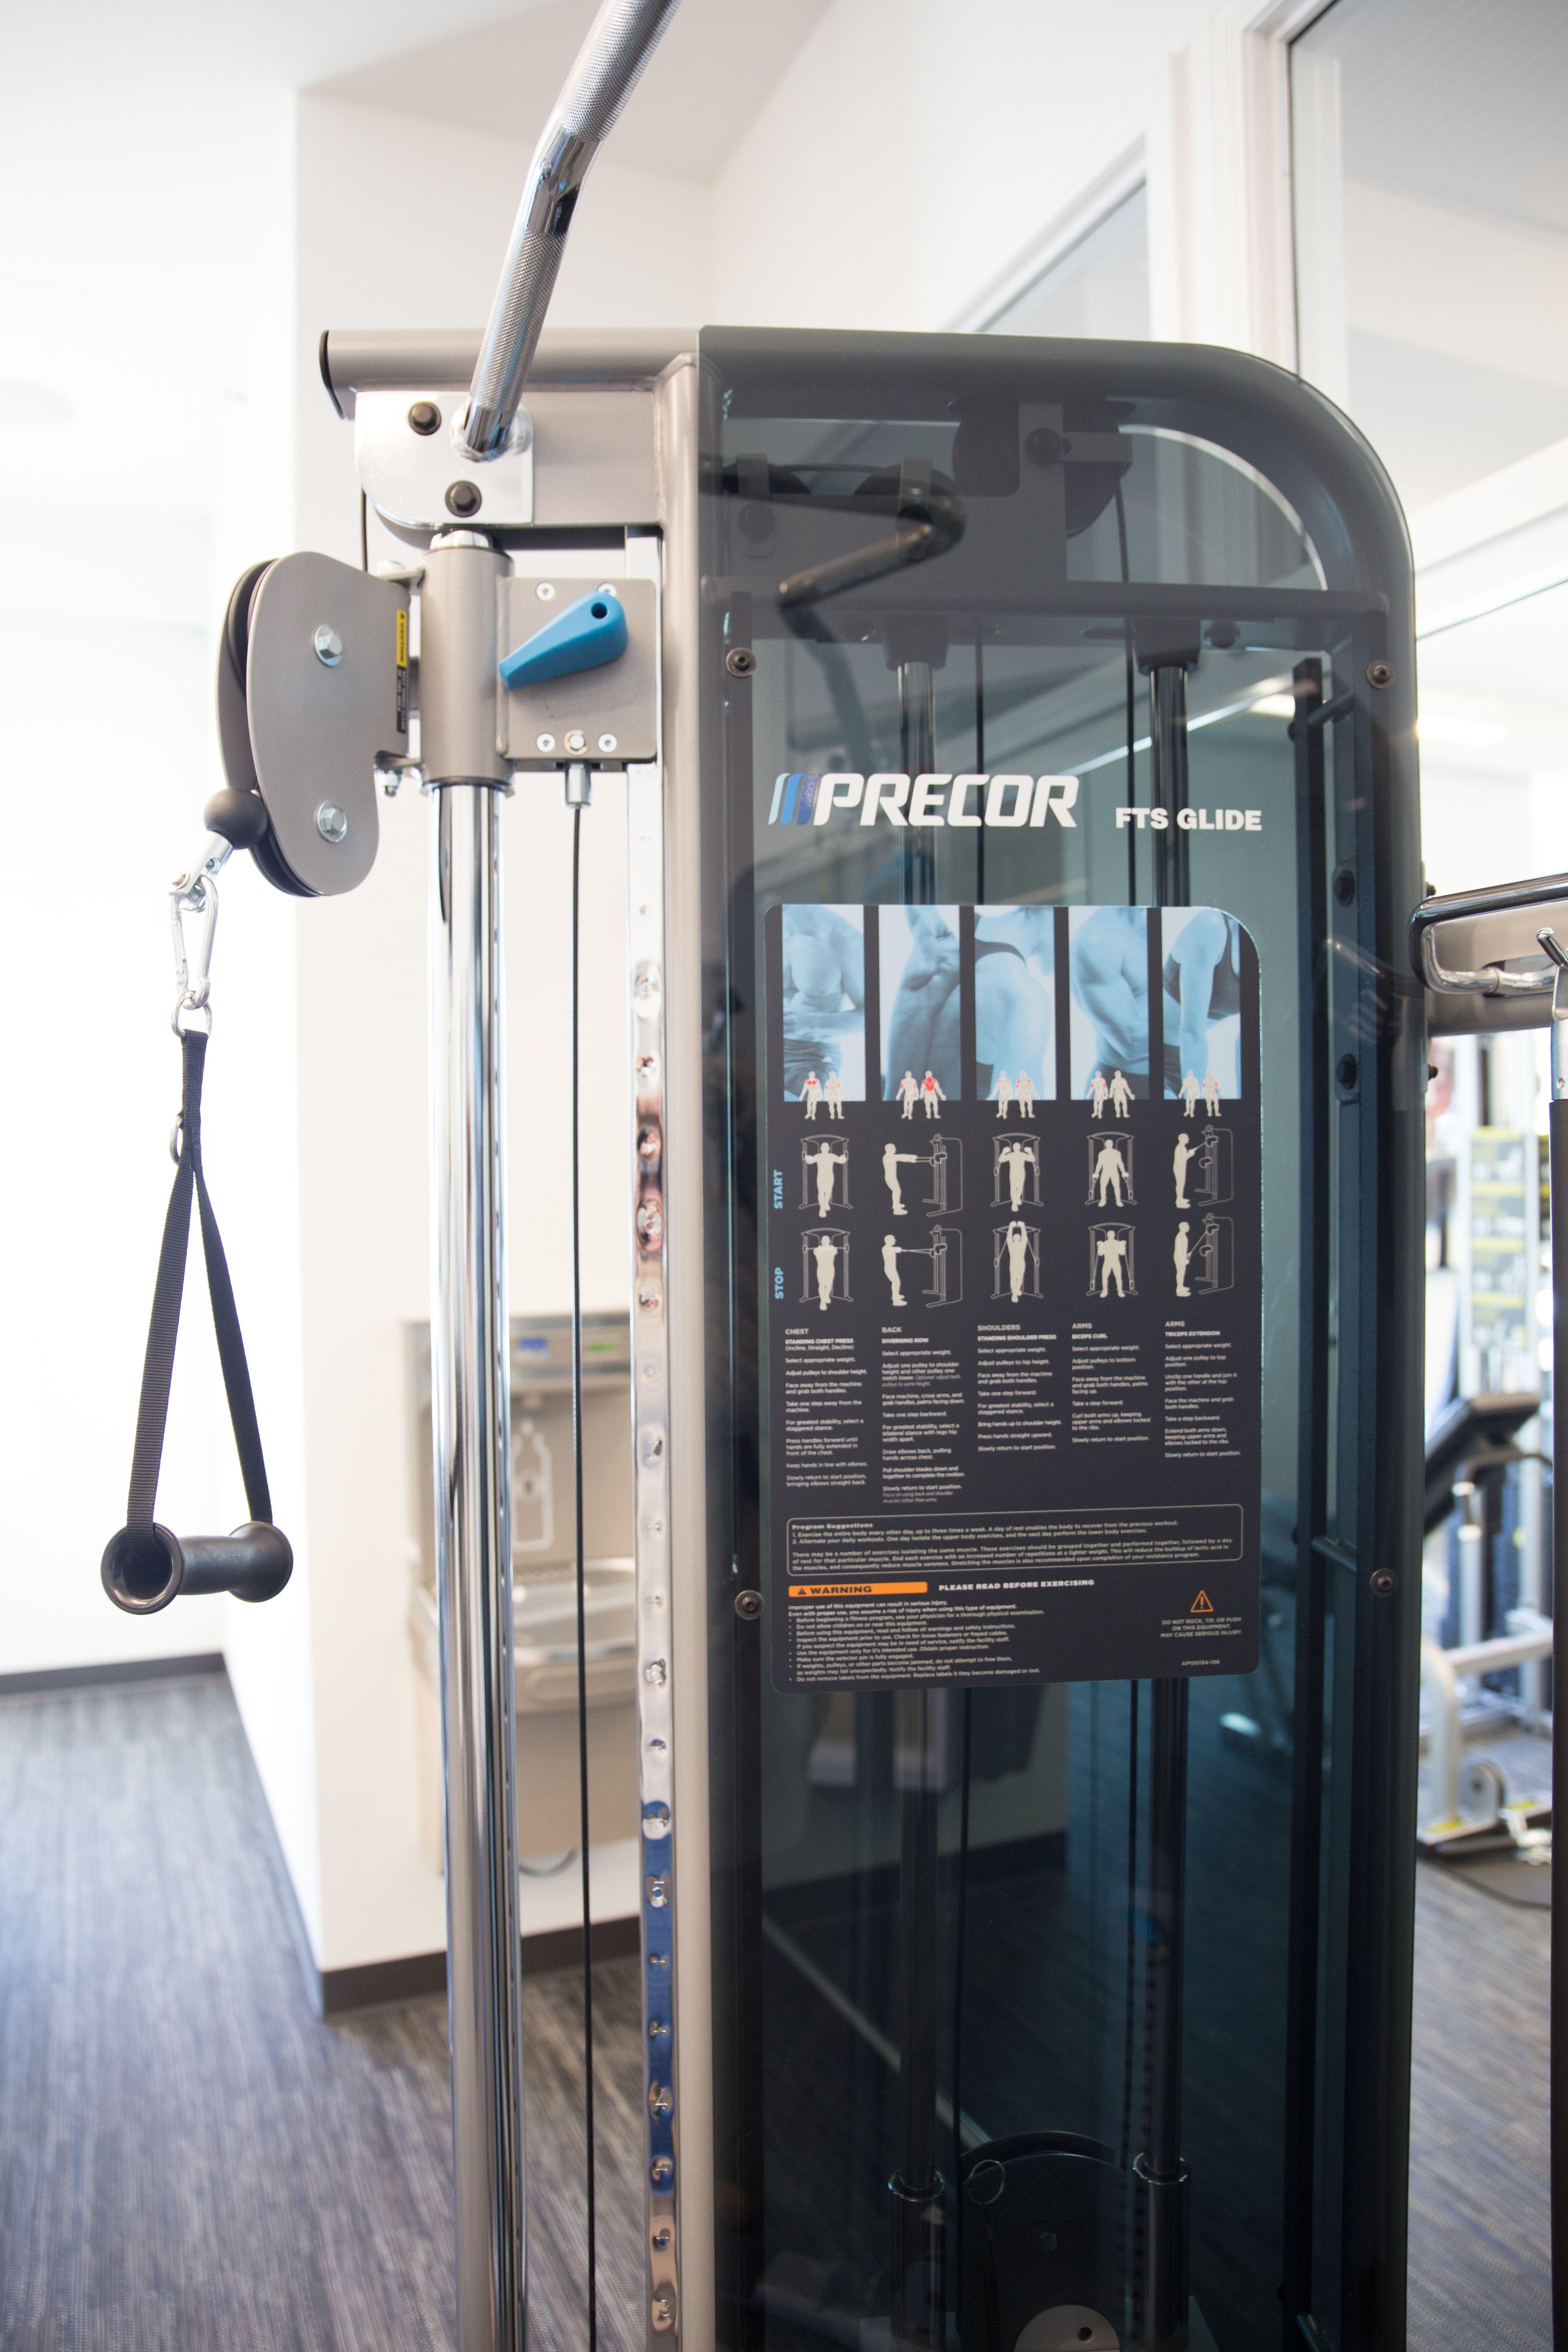 Pin By Steven Scott Management Inc On Waterstone Place Fitness Center Renovation Renovations Apartment Minnetonka